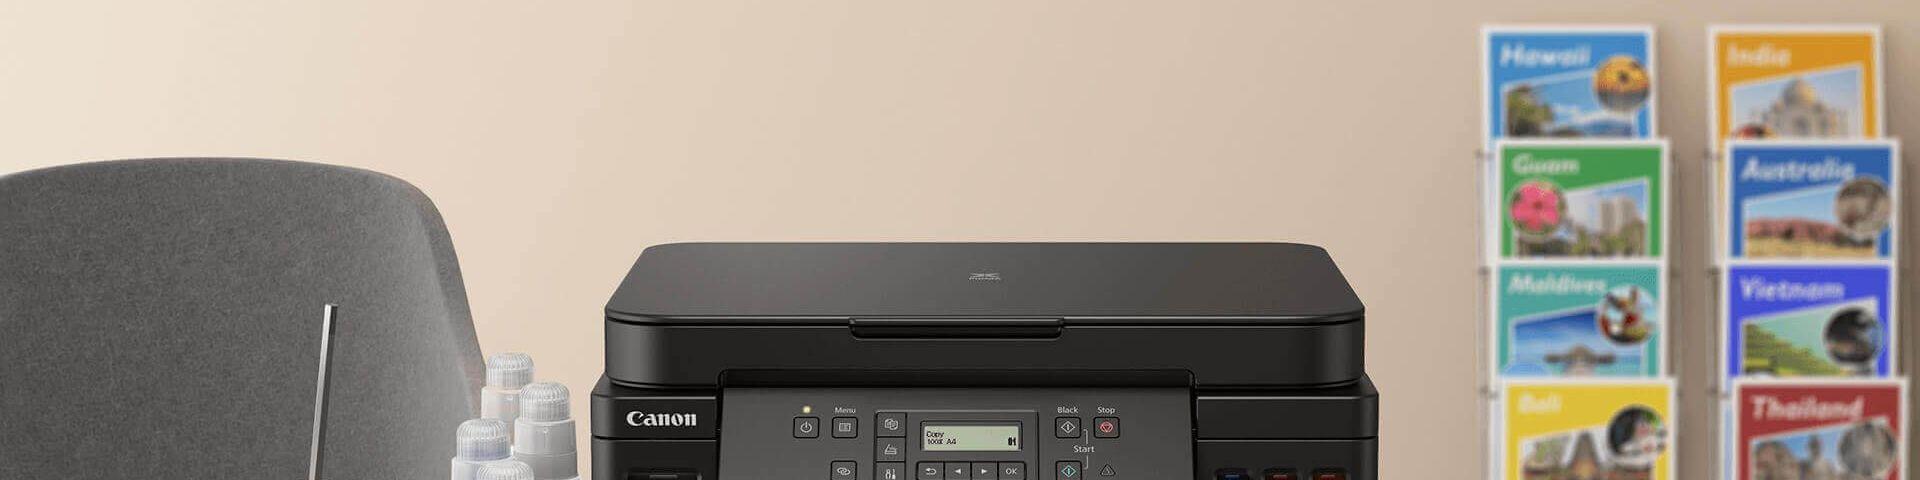 MegaTank Printers - PIXMA G Series - Canon Cyprus